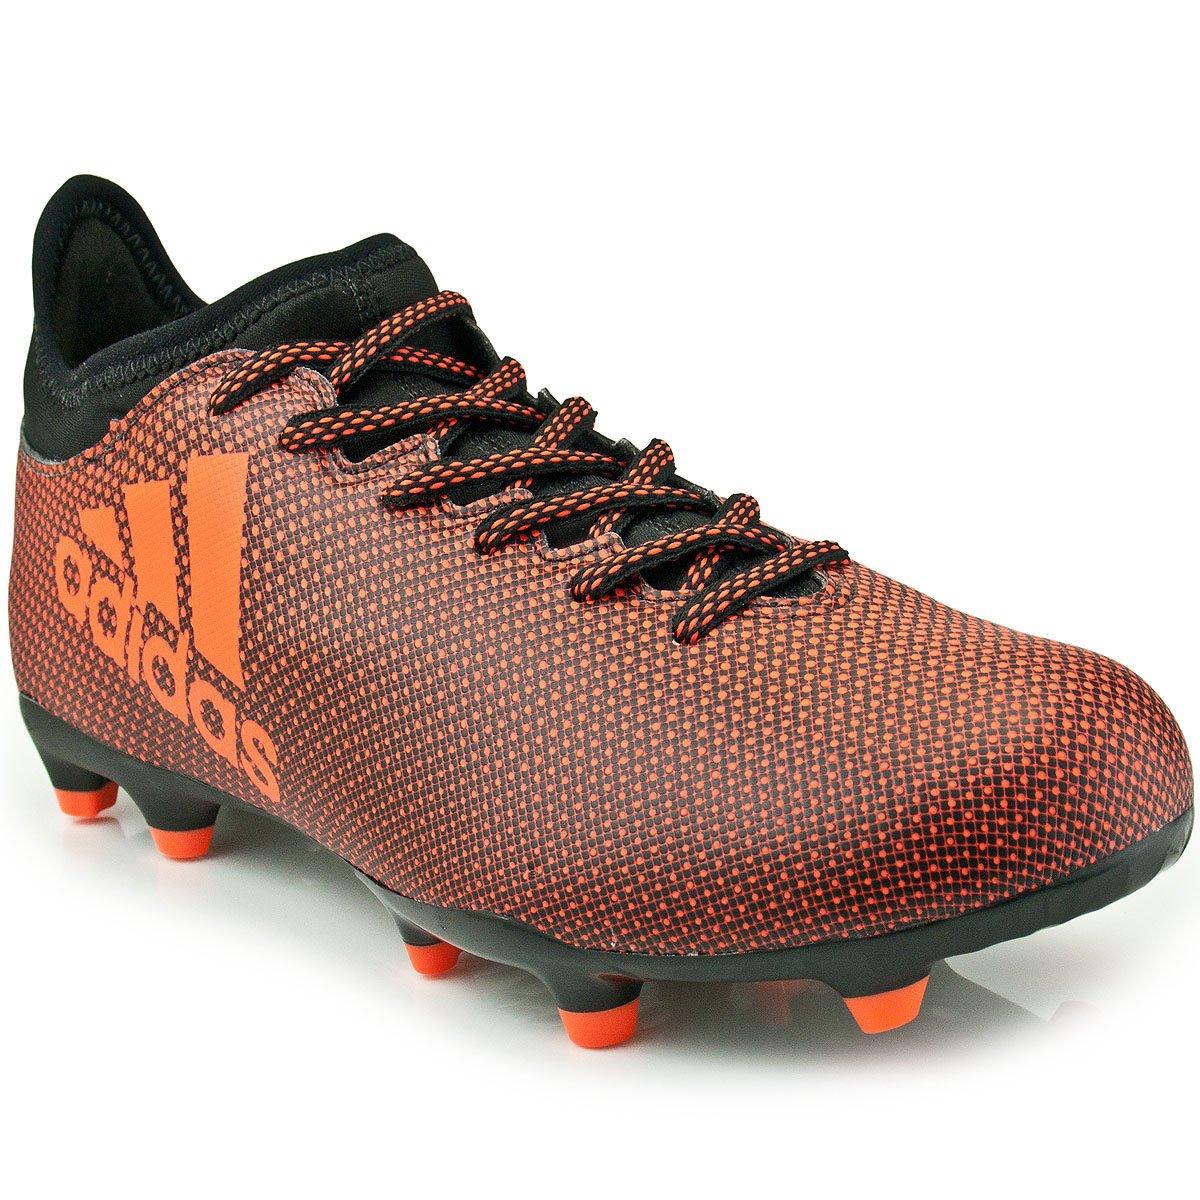 5d8313fa54cf4 Chuteira Adidas X 17.3 FG